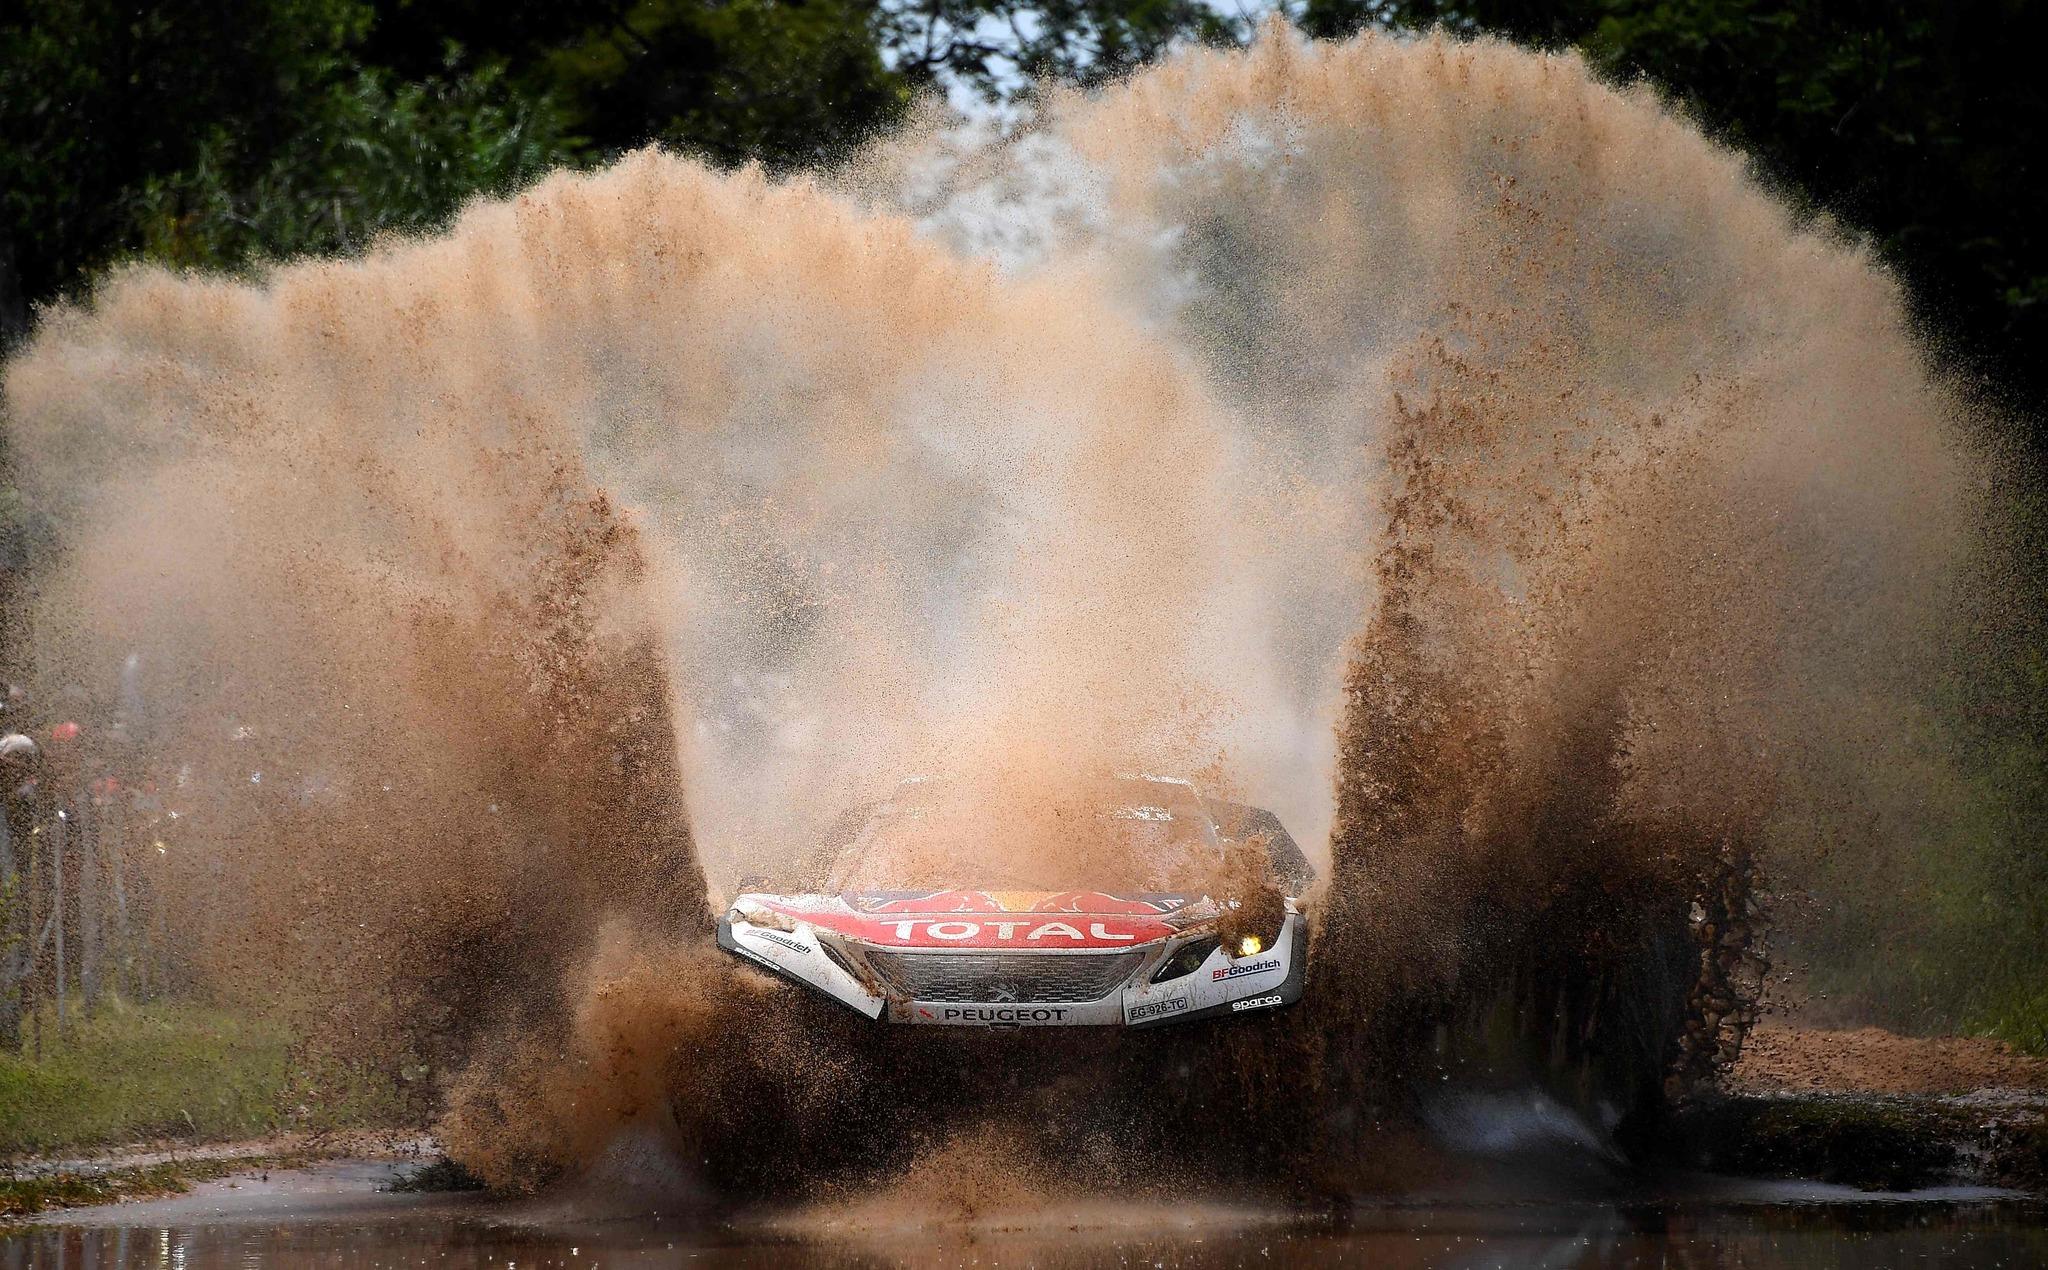 Rally Dakar (coches) 2017 14834662375808